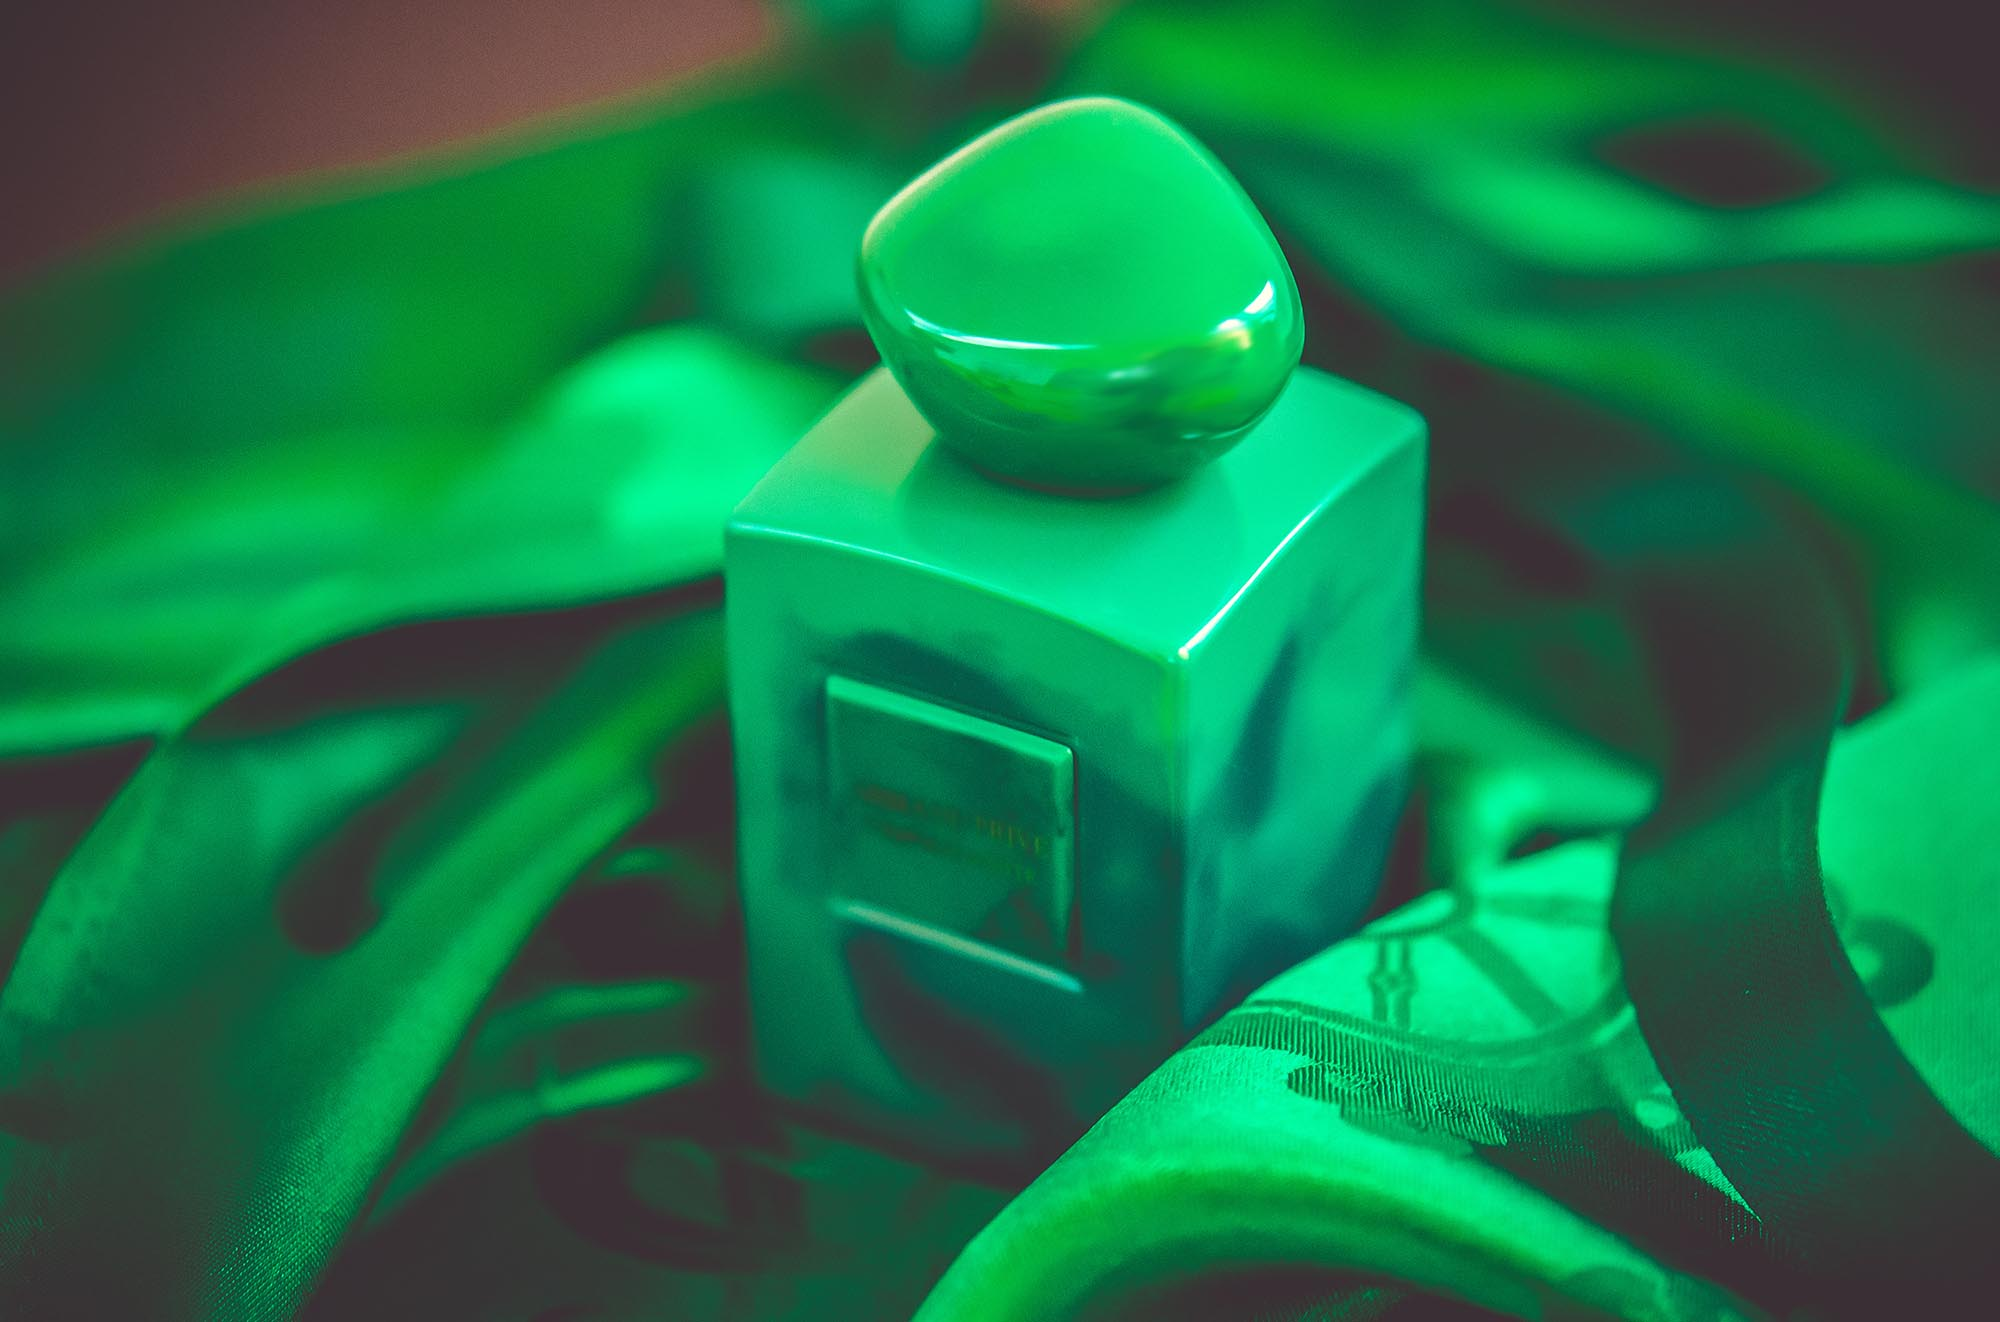 Armani Prive Vert Malachite niche perfume Parfüm парфюм green grün зеленый